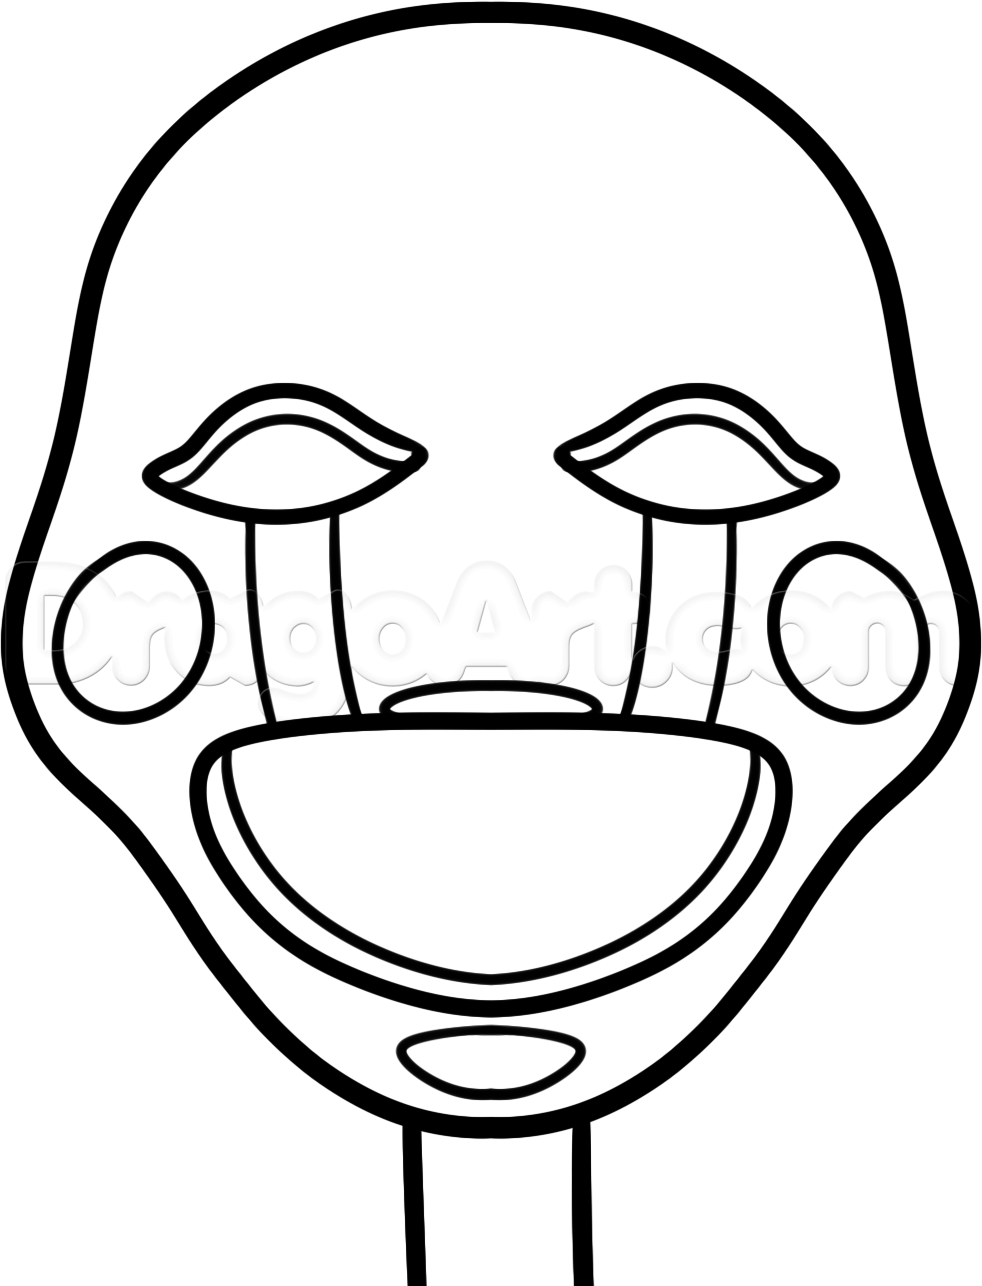 Fnaf Drawing Games At Getdrawings Com Free For Personal Use Fnaf